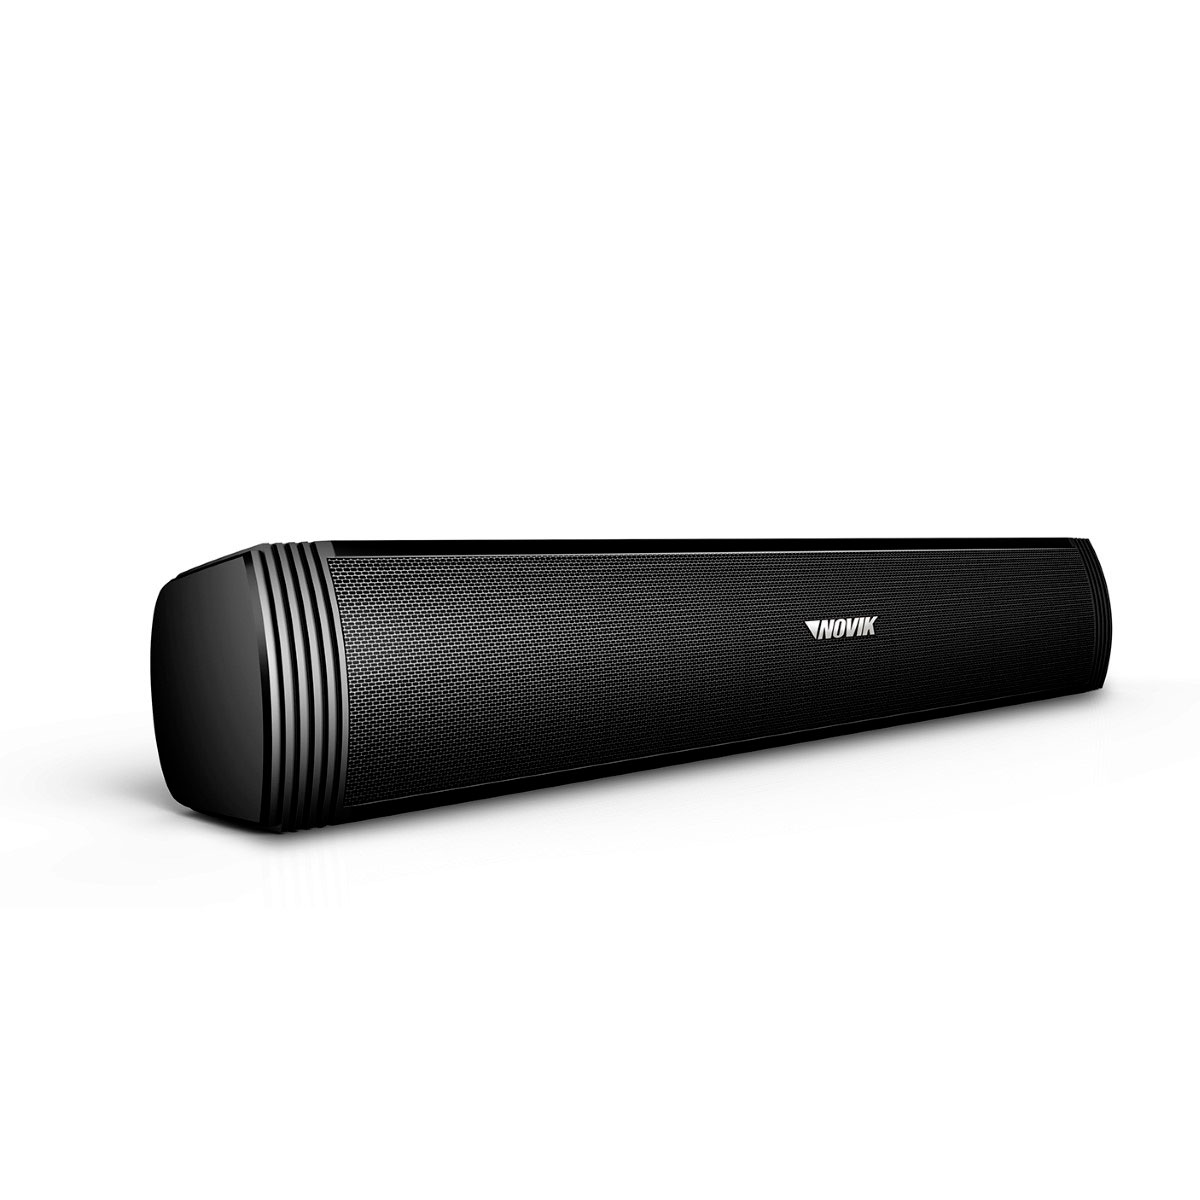 CAIXA SOUNDBAR 2.1 AUDIO SYSTEM CINEMA 3 BLUETOOTH 80W BIVOLT  - Audio Video & cia